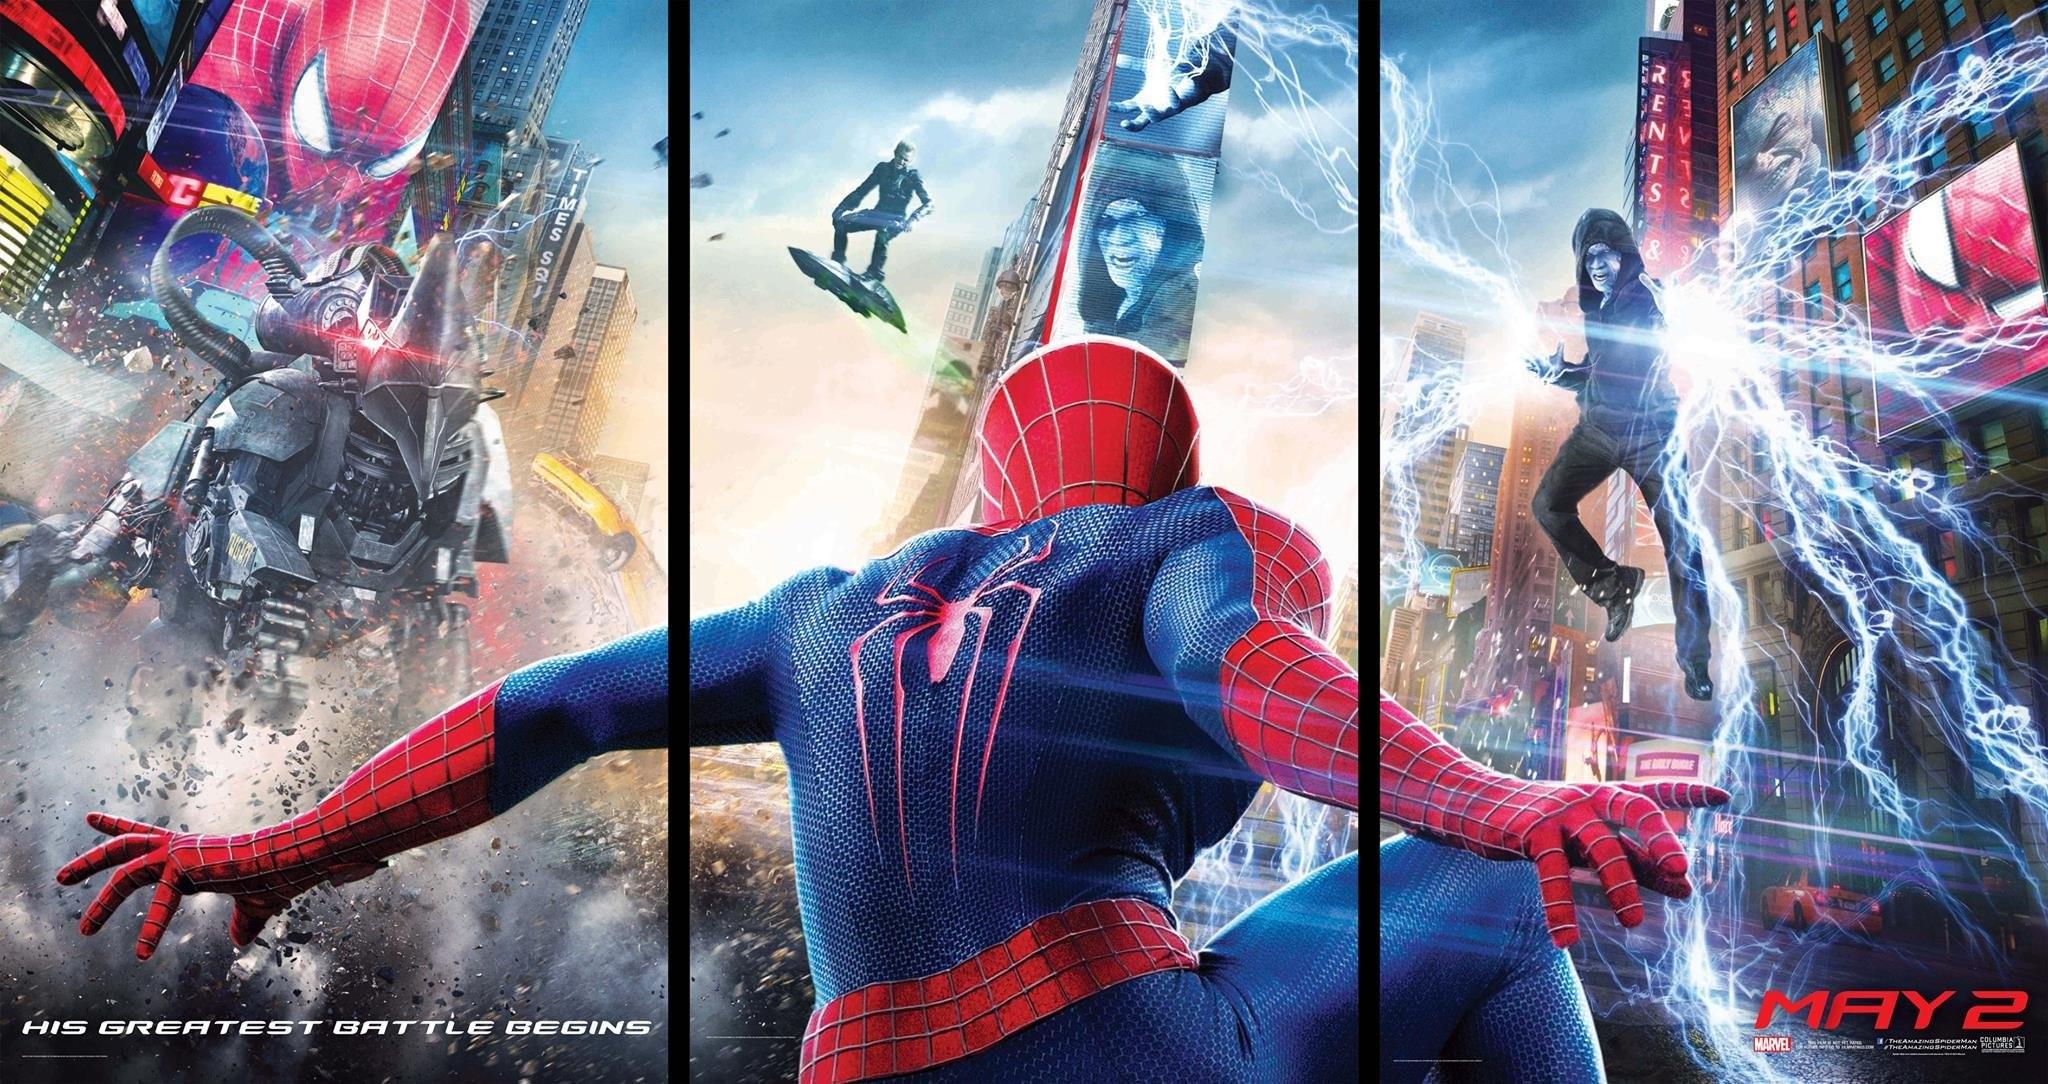 Wonderful Wallpaper Marvel Windows 10 - 993891-marvel-superheroes-wallpaper-2048x1084-windows-10  Best Photo Reference_39486.jpg